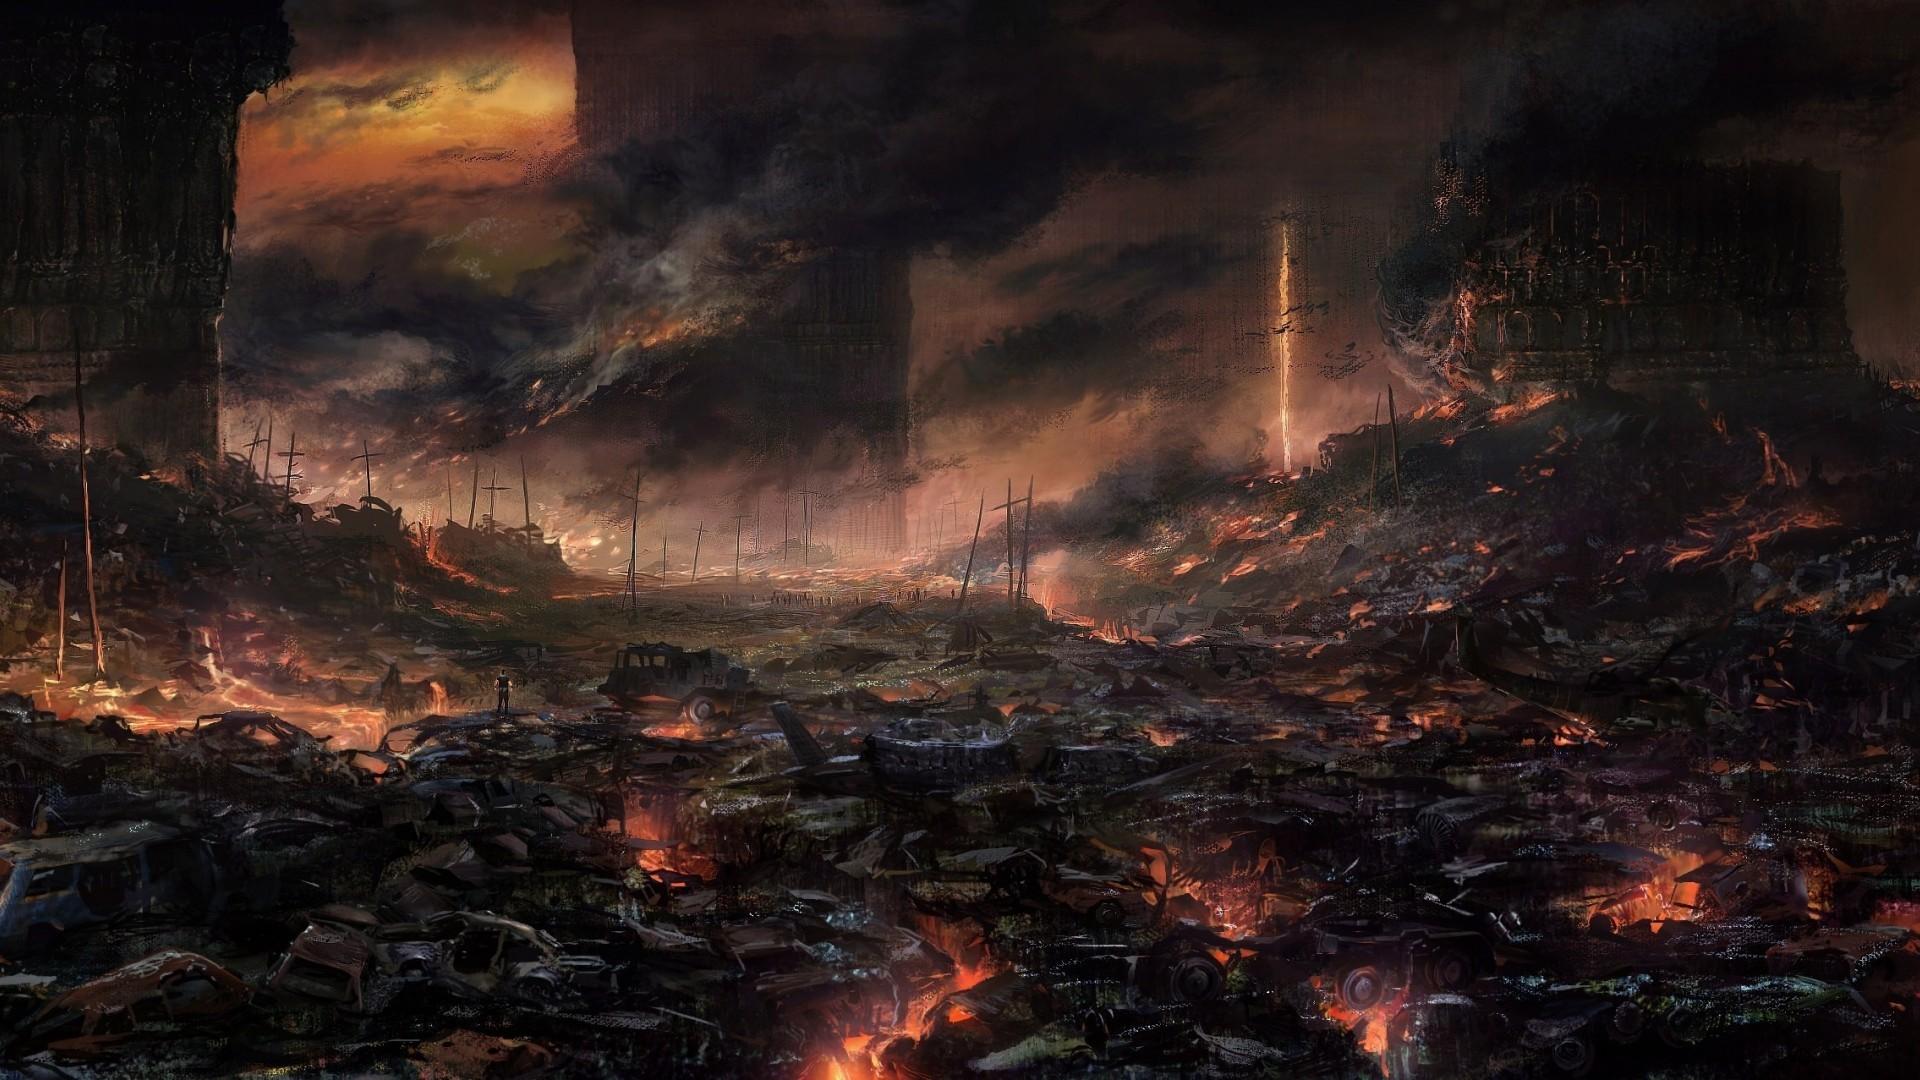 apocalyptic artwork fire explosion wasteland disaster wildfire darkness screenshot geological phenomenon